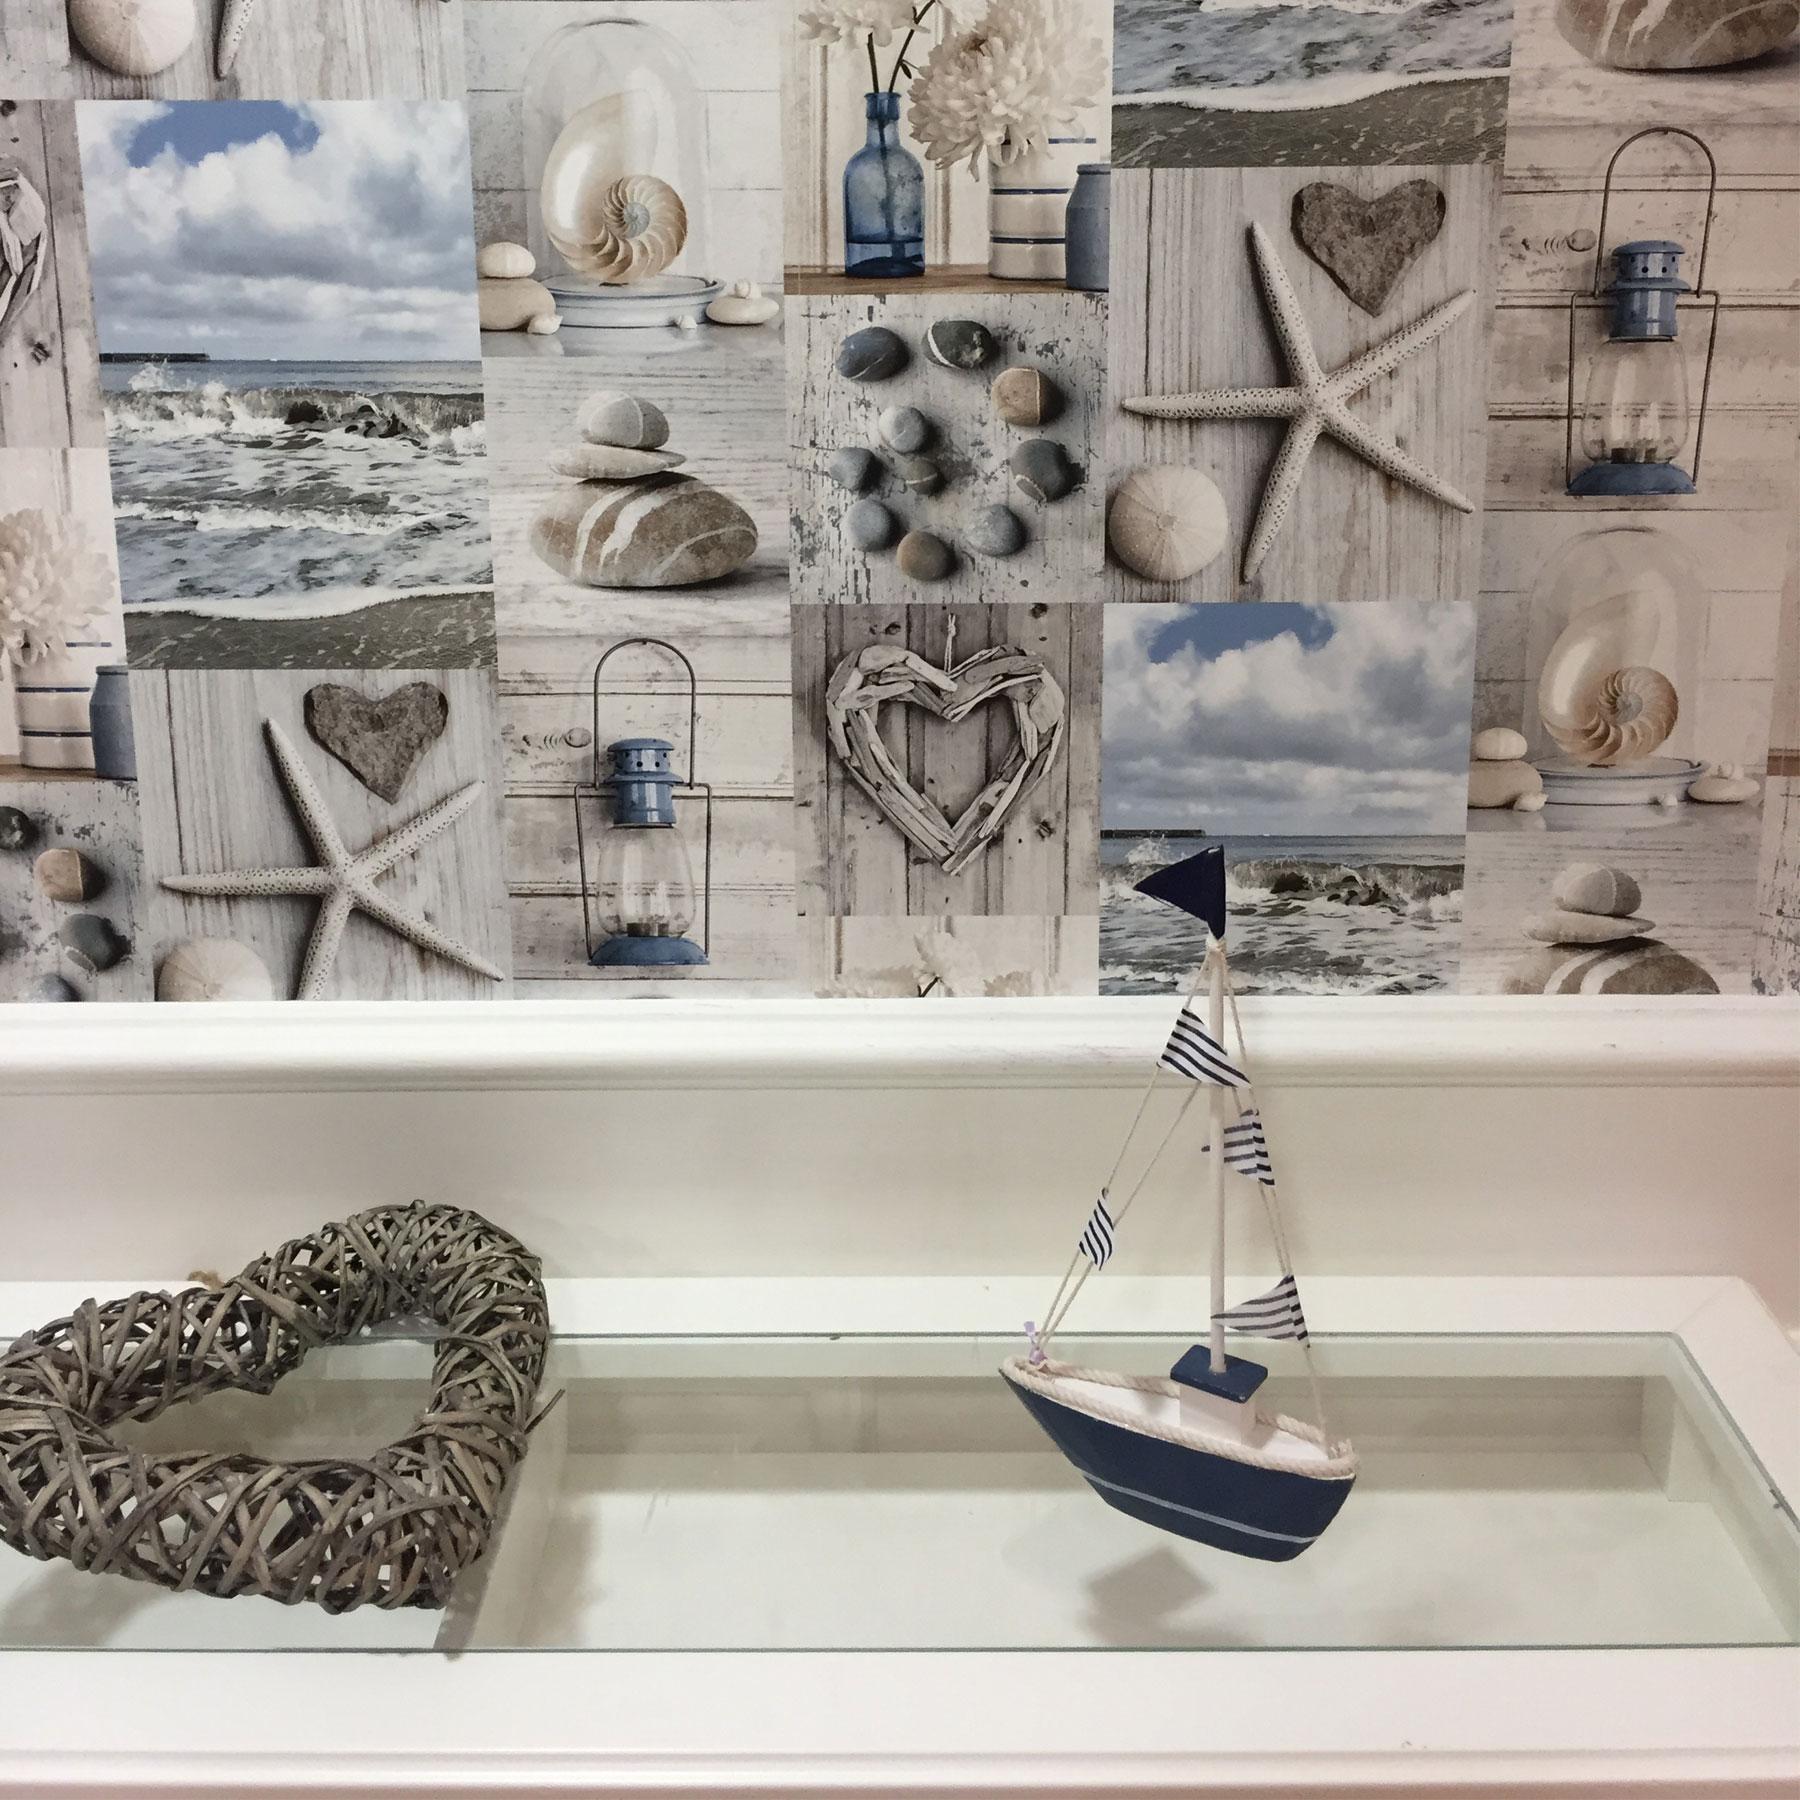 Rustic Nautical Bathroom Decor: Beach Wallpaper Nautical Bathroom Pebbles Love Hearts Blue